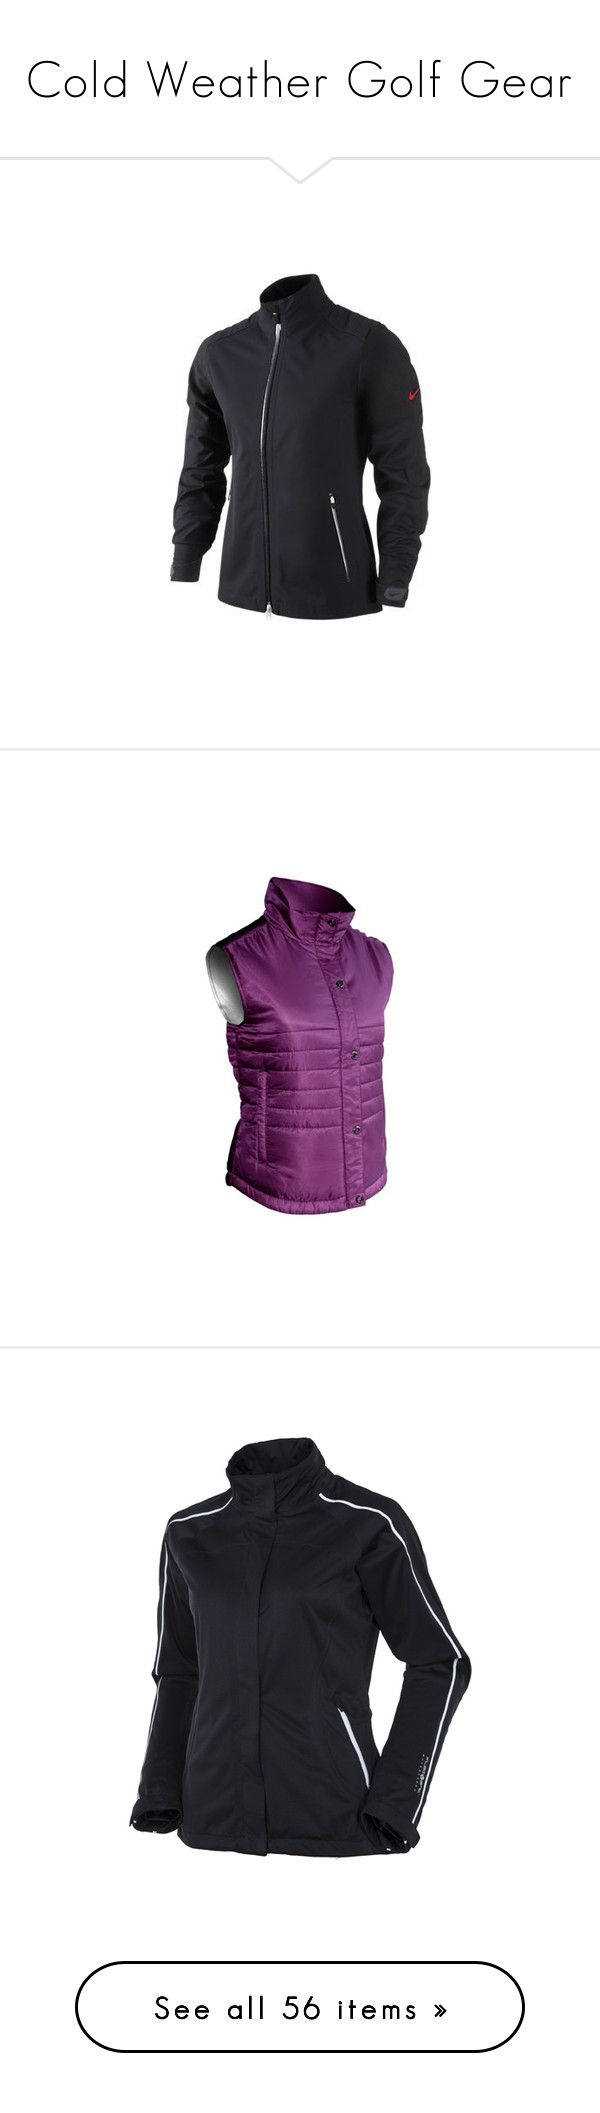 """Cold Weather Golf Gear"" by lorisgolfshoppe ❤ liked on Polyvore featuring activewear, nike activewear, nike, nike sportswear, outerwear, jackets, waterproof golf jacket, plus size womens jackets, plus size jackets and golf jackets"